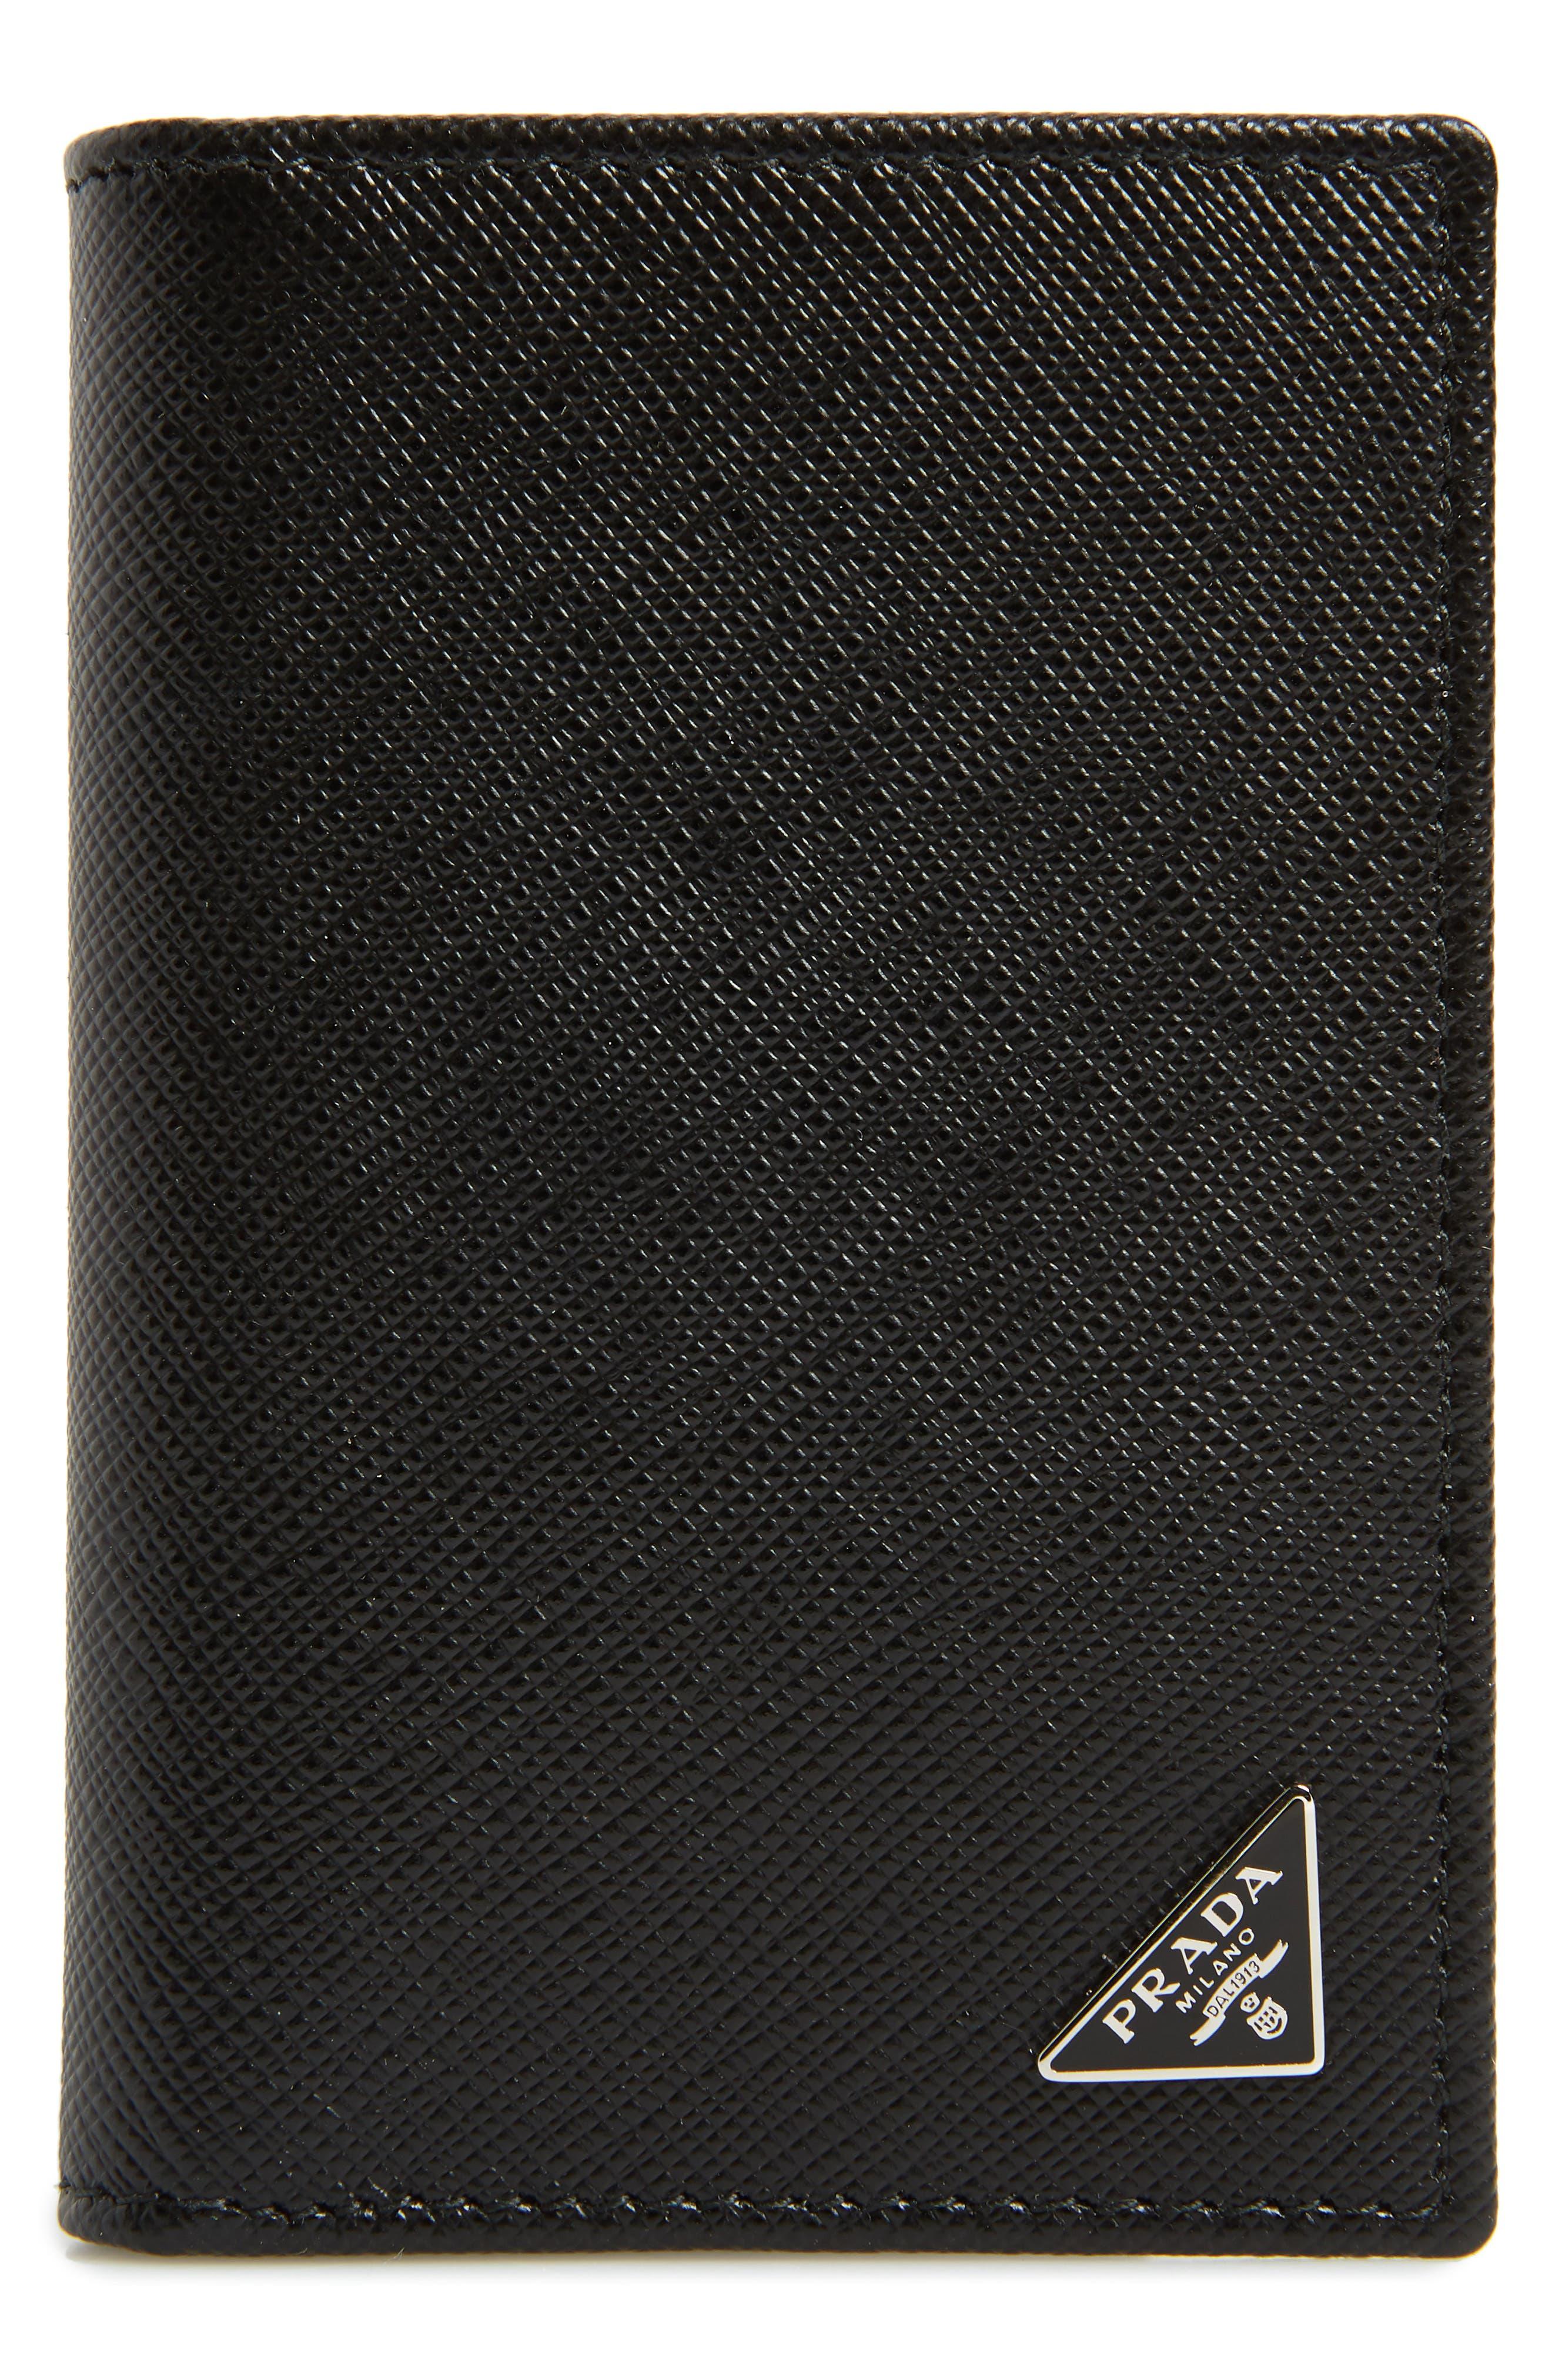 Long Saffiano Leather Card Case,                             Main thumbnail 1, color,                             001